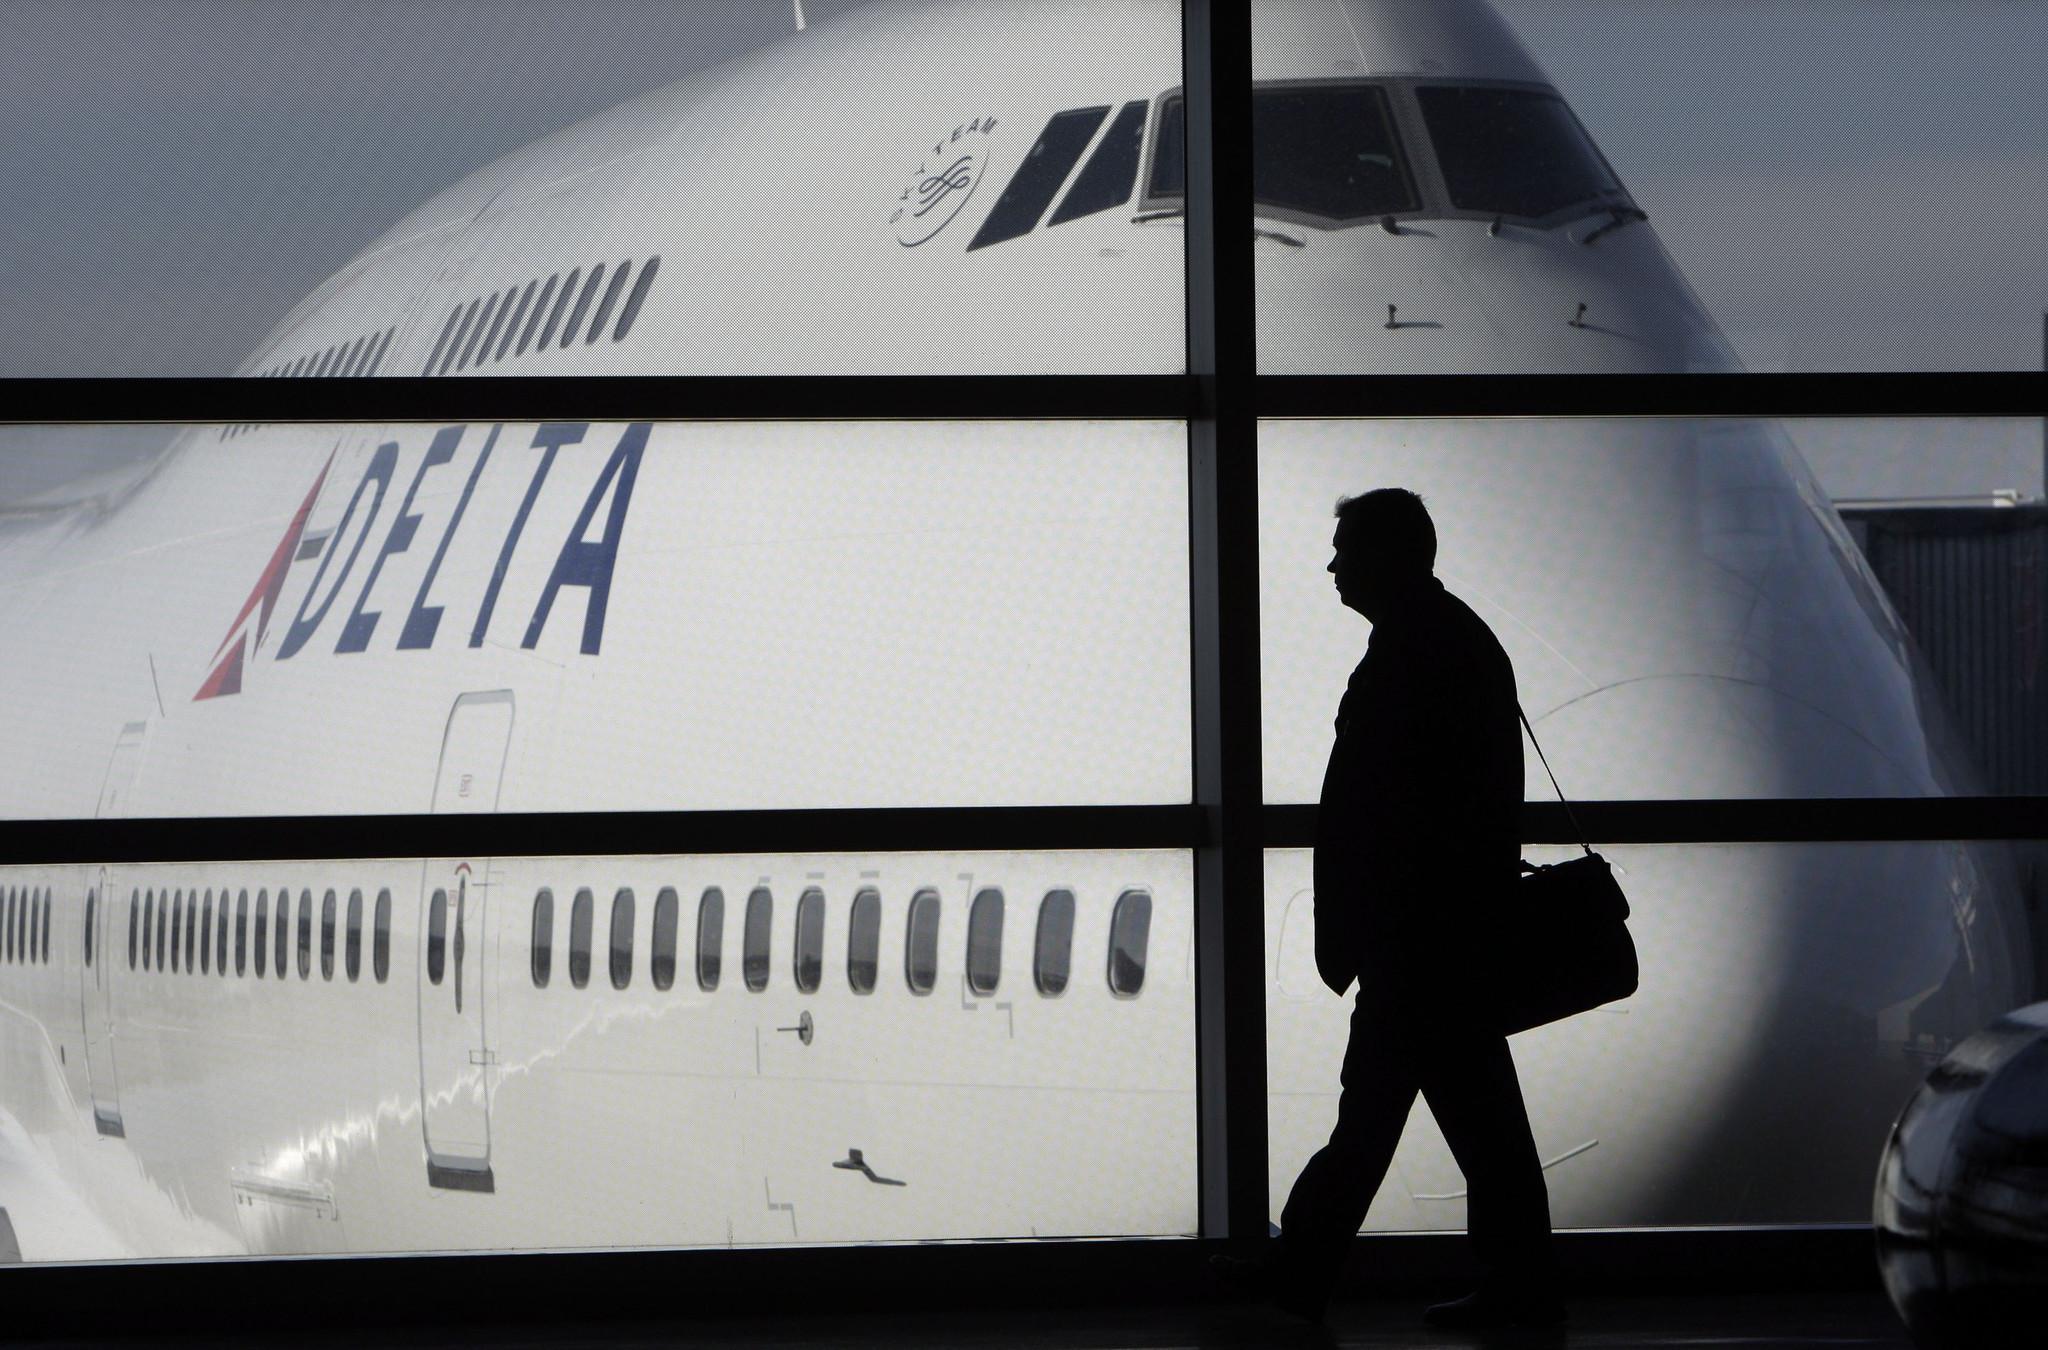 Flight turns into 30-hour ordeal for Delta passengers - Chicago Tribune 7843898970397